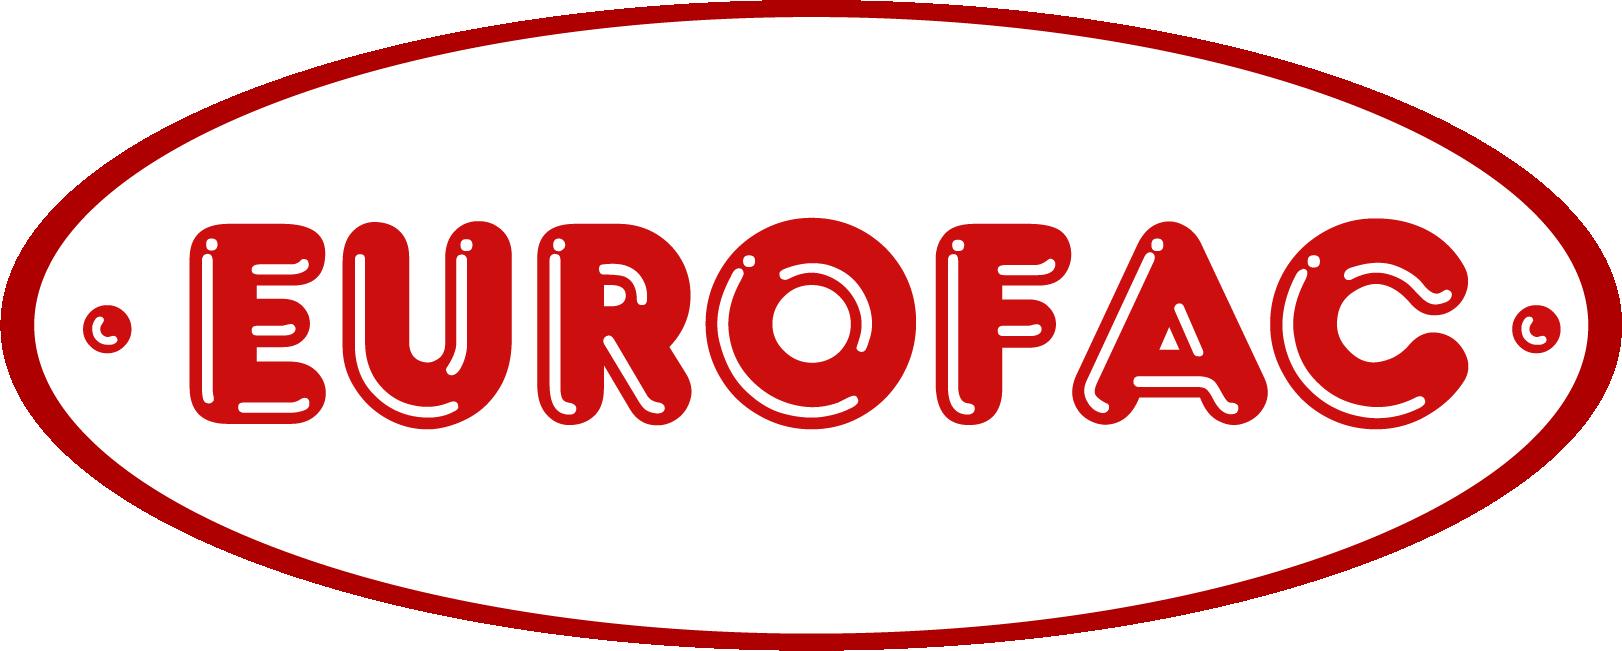 Eurofac pneu (vente, montage)